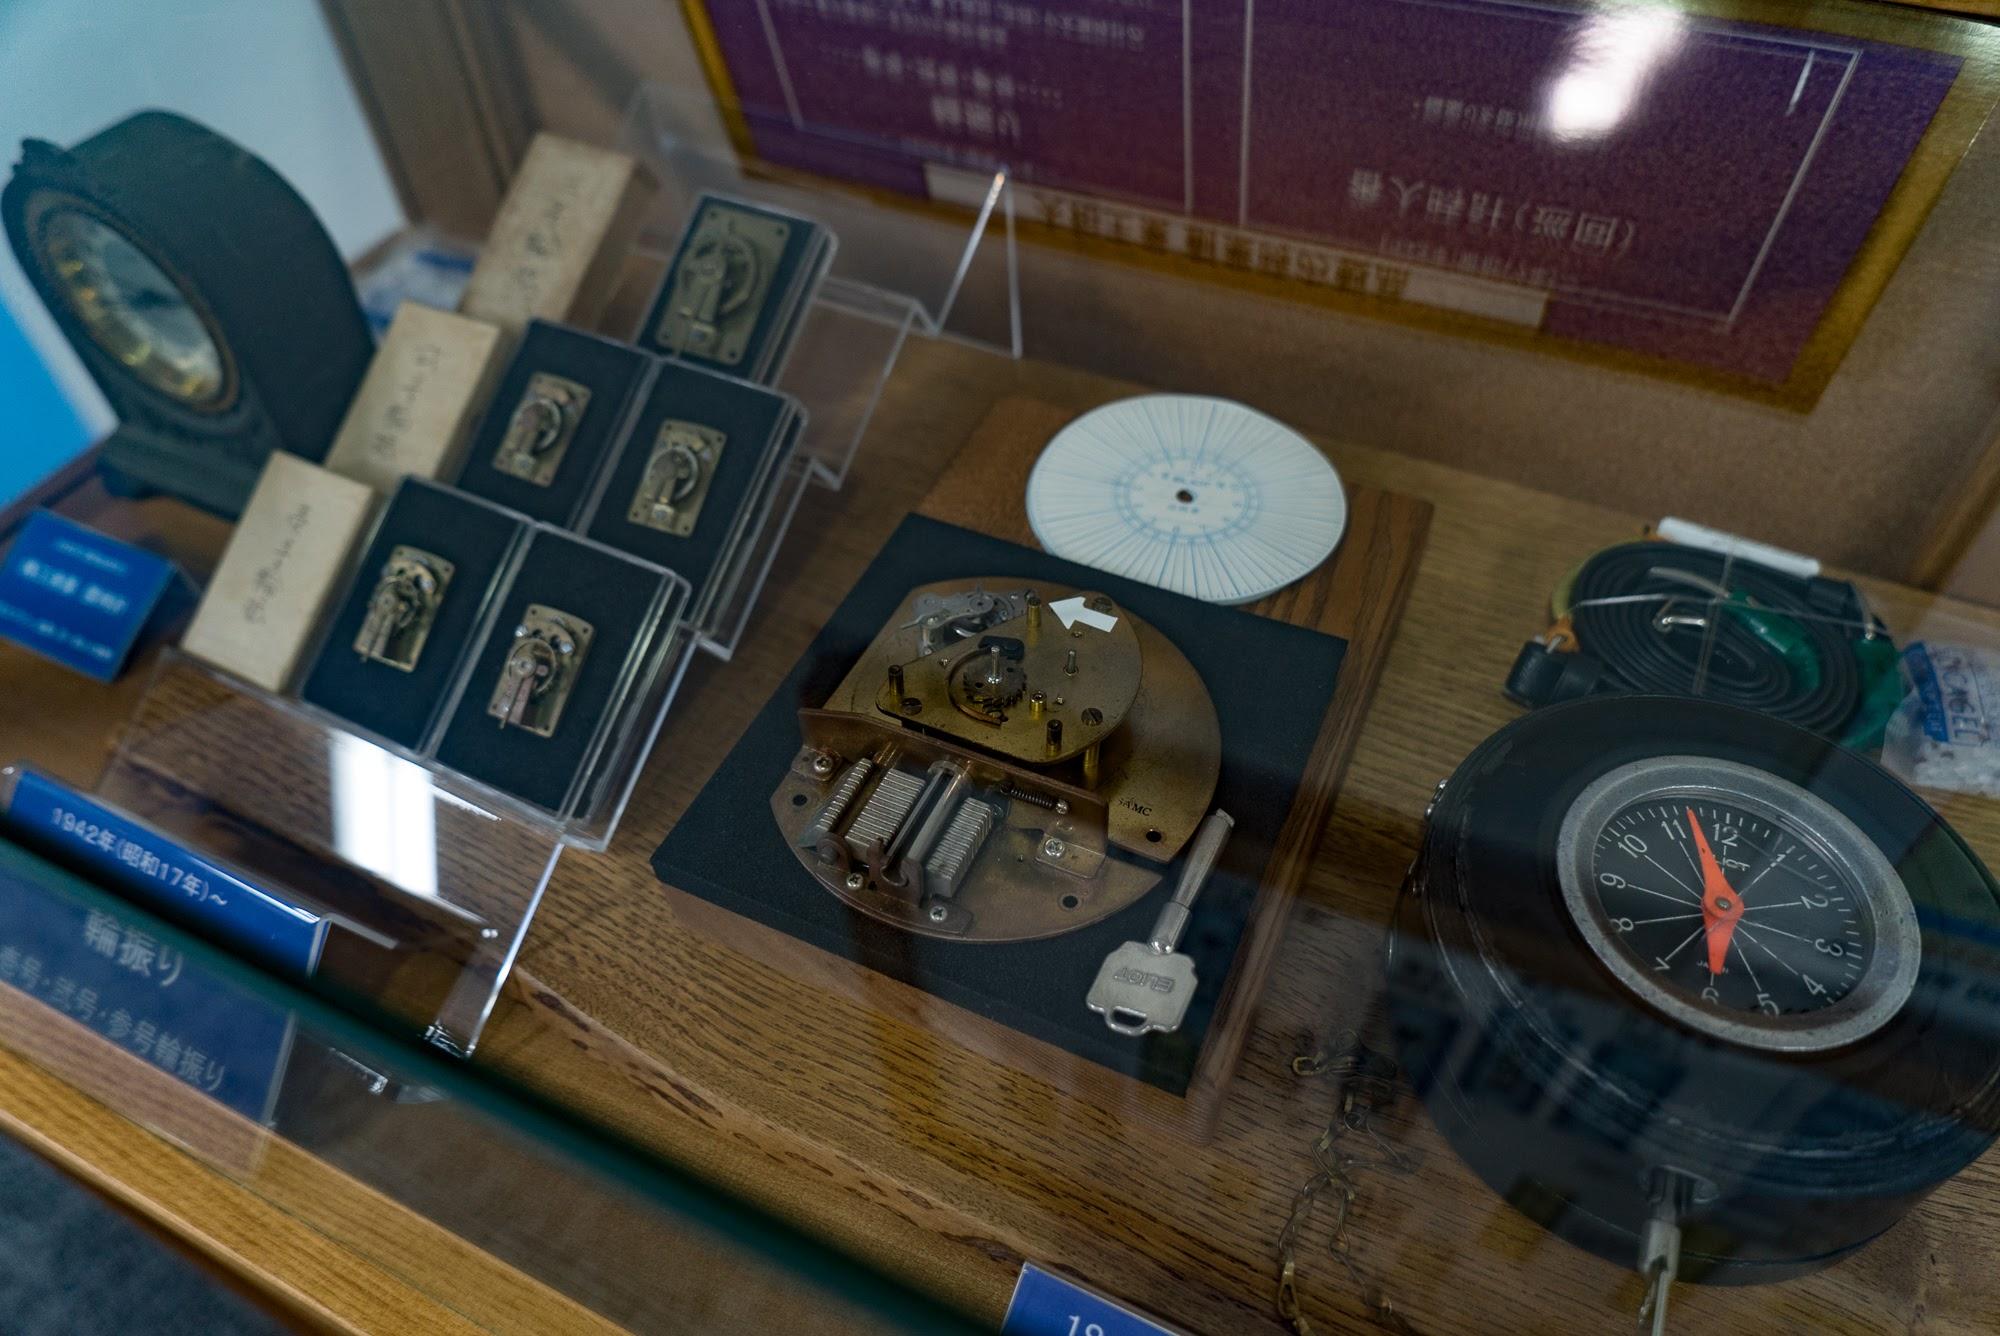 Initial Daiwa-Kogyo Products